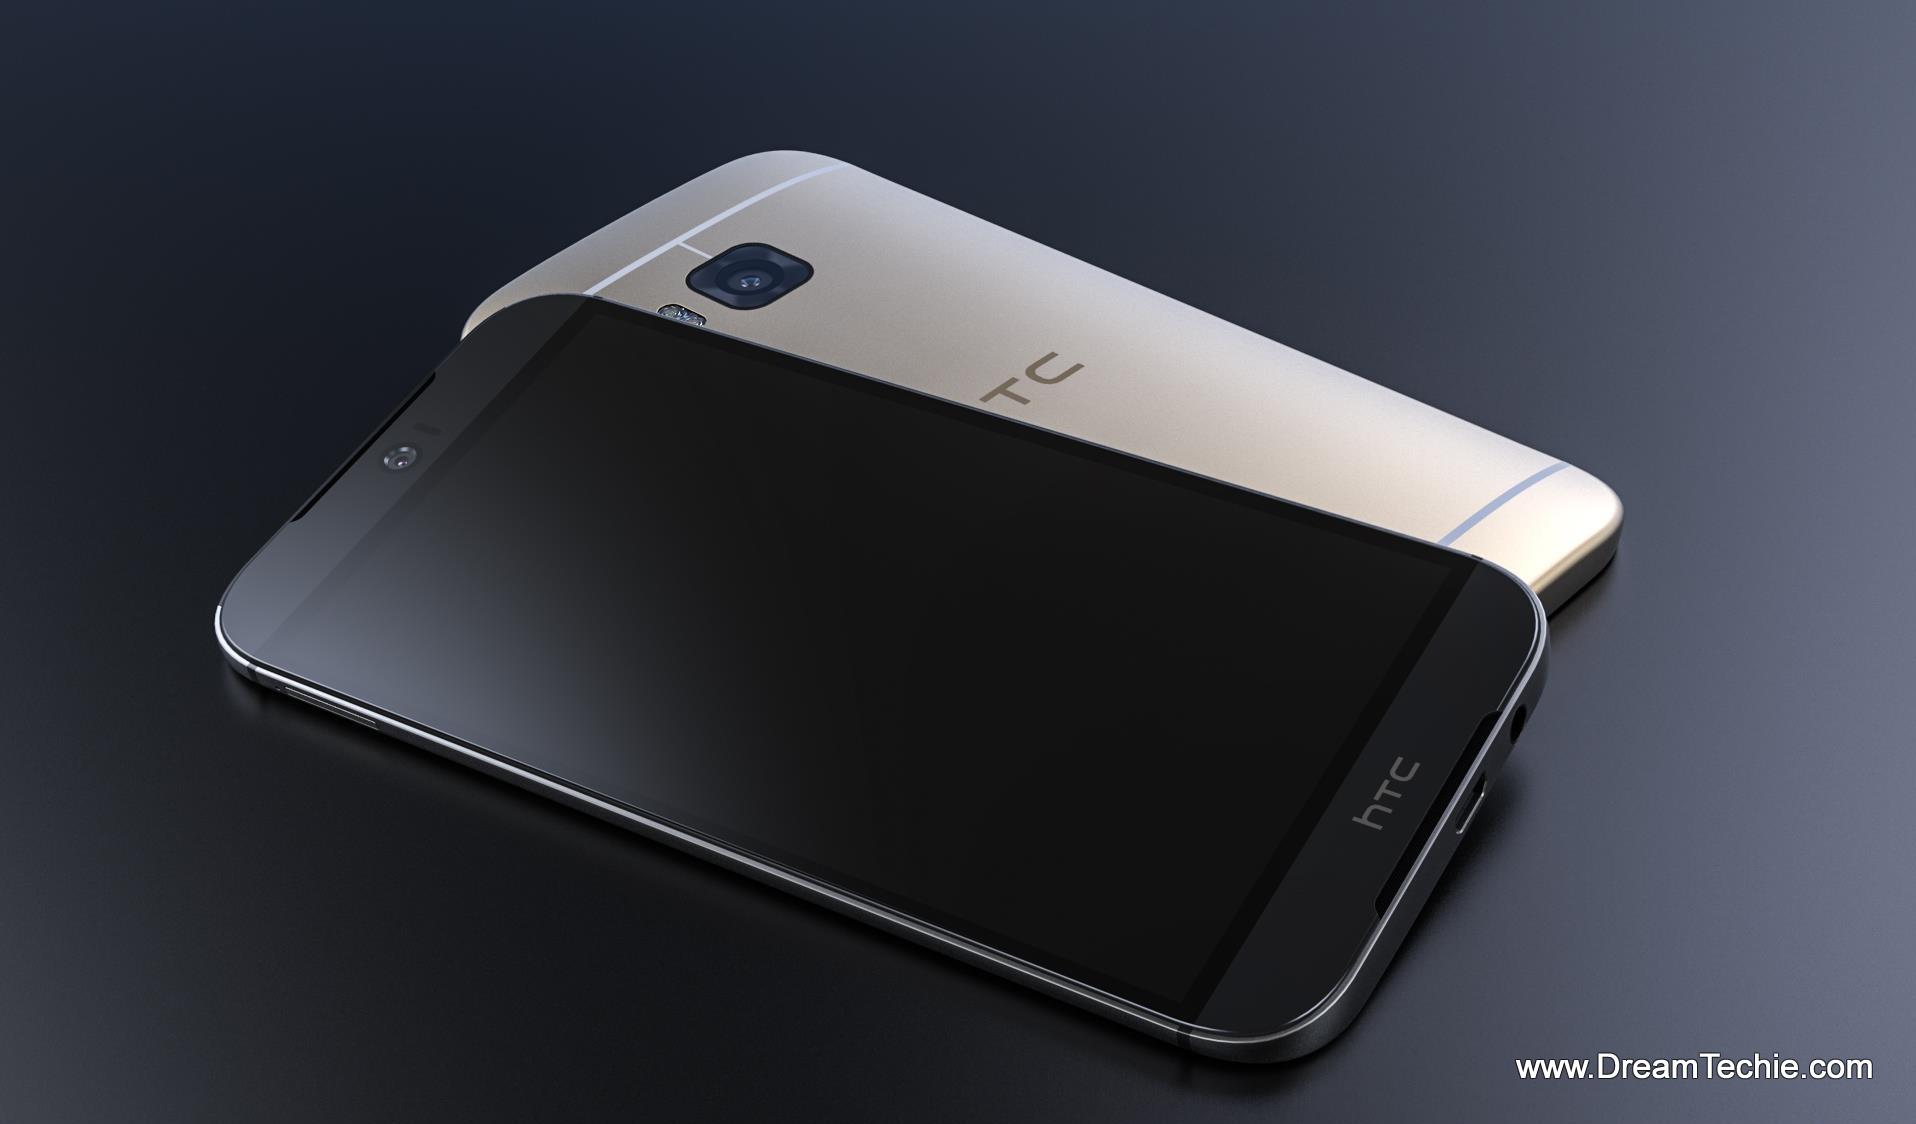 HTC One M10 Smartphone